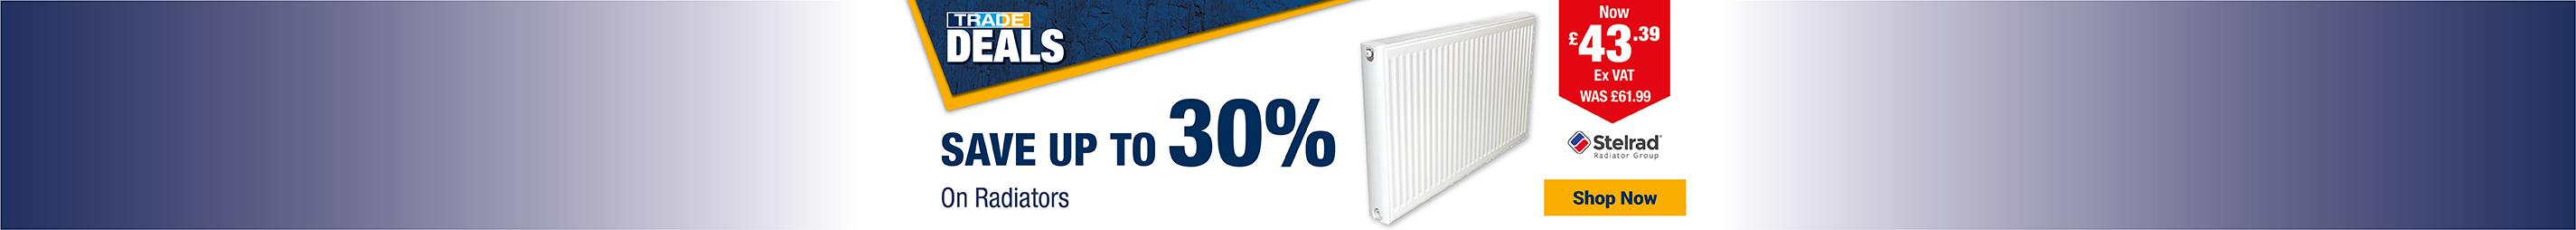 Save Up To 30% On Radiators